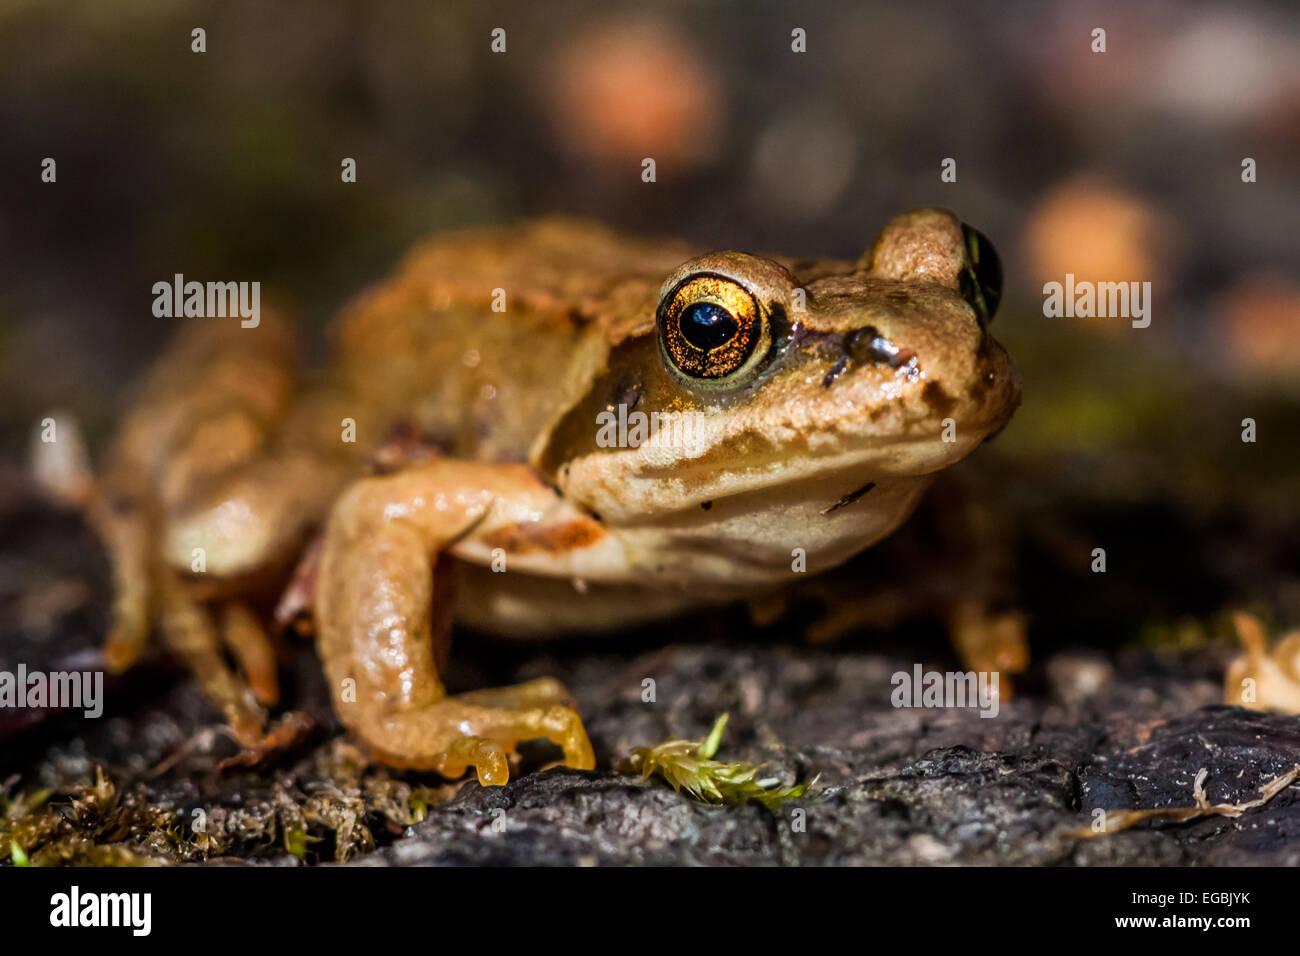 European common frog (Rana temporaria) - Stock Image